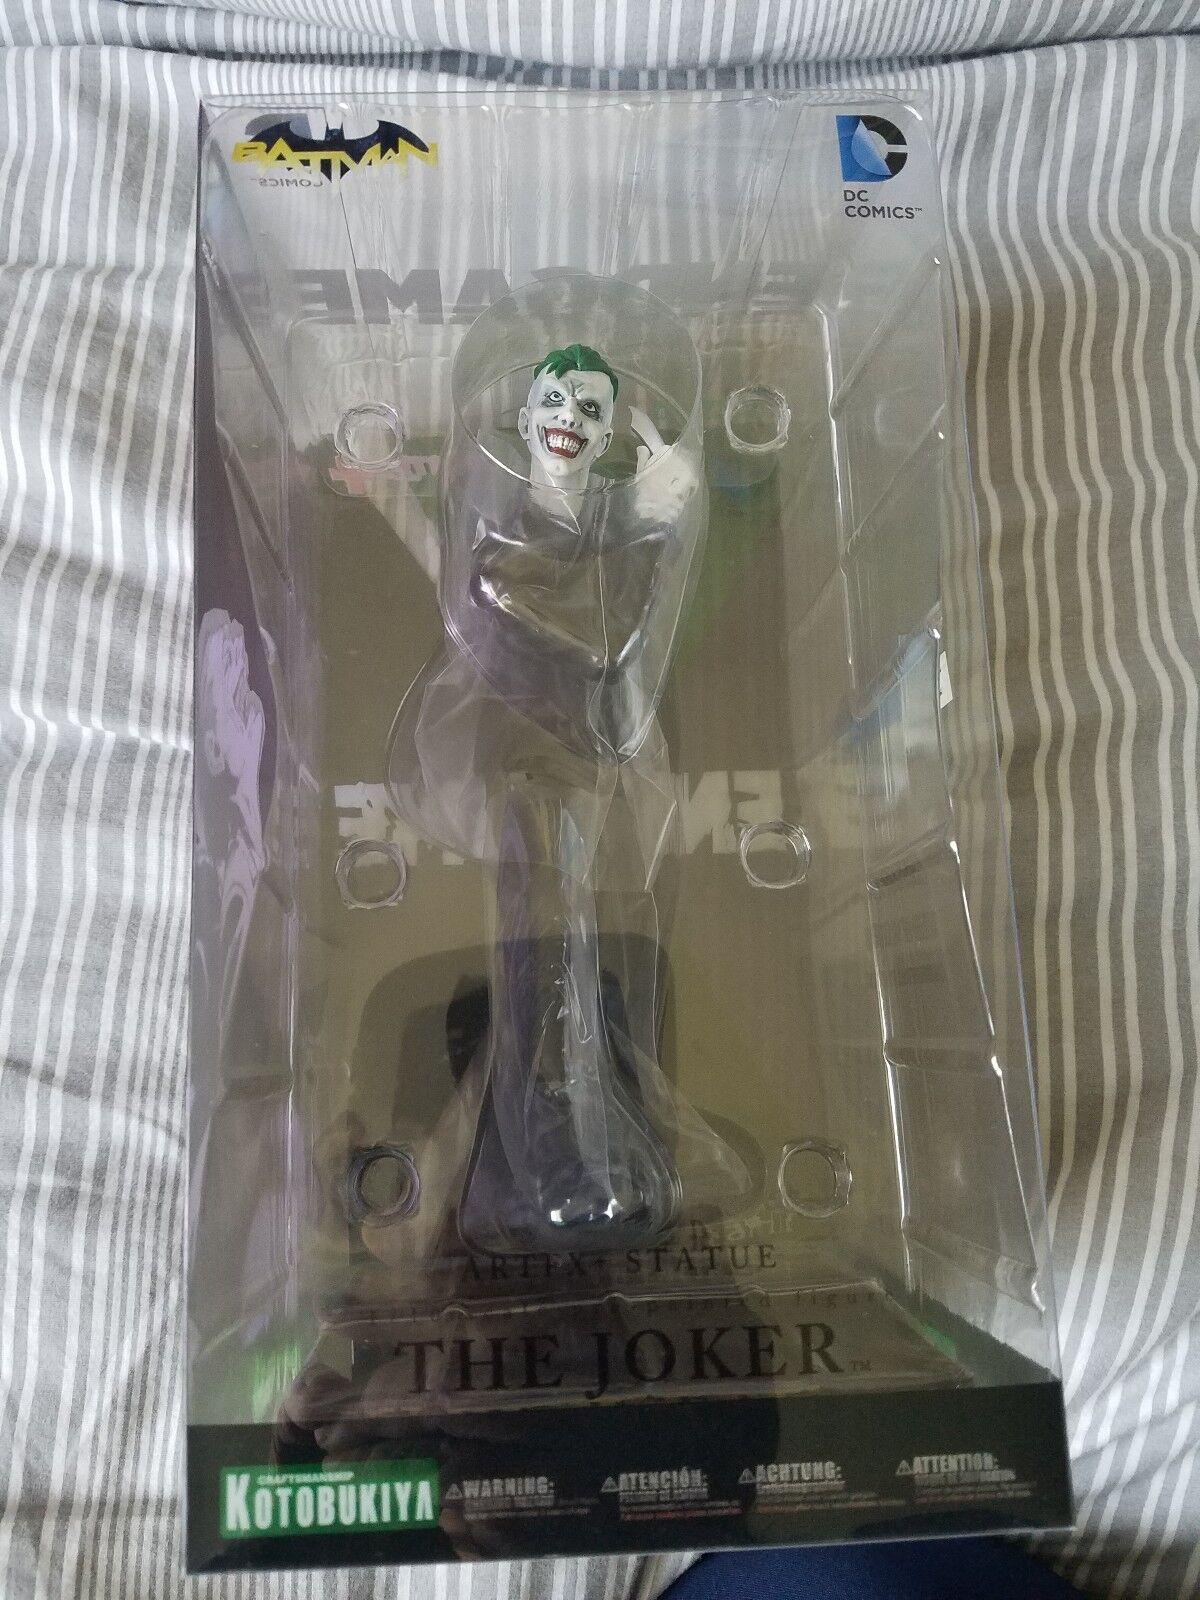 Kotobukiya dc comics greg capullo ist joker endspiel neuen 52 7.artfx + statue